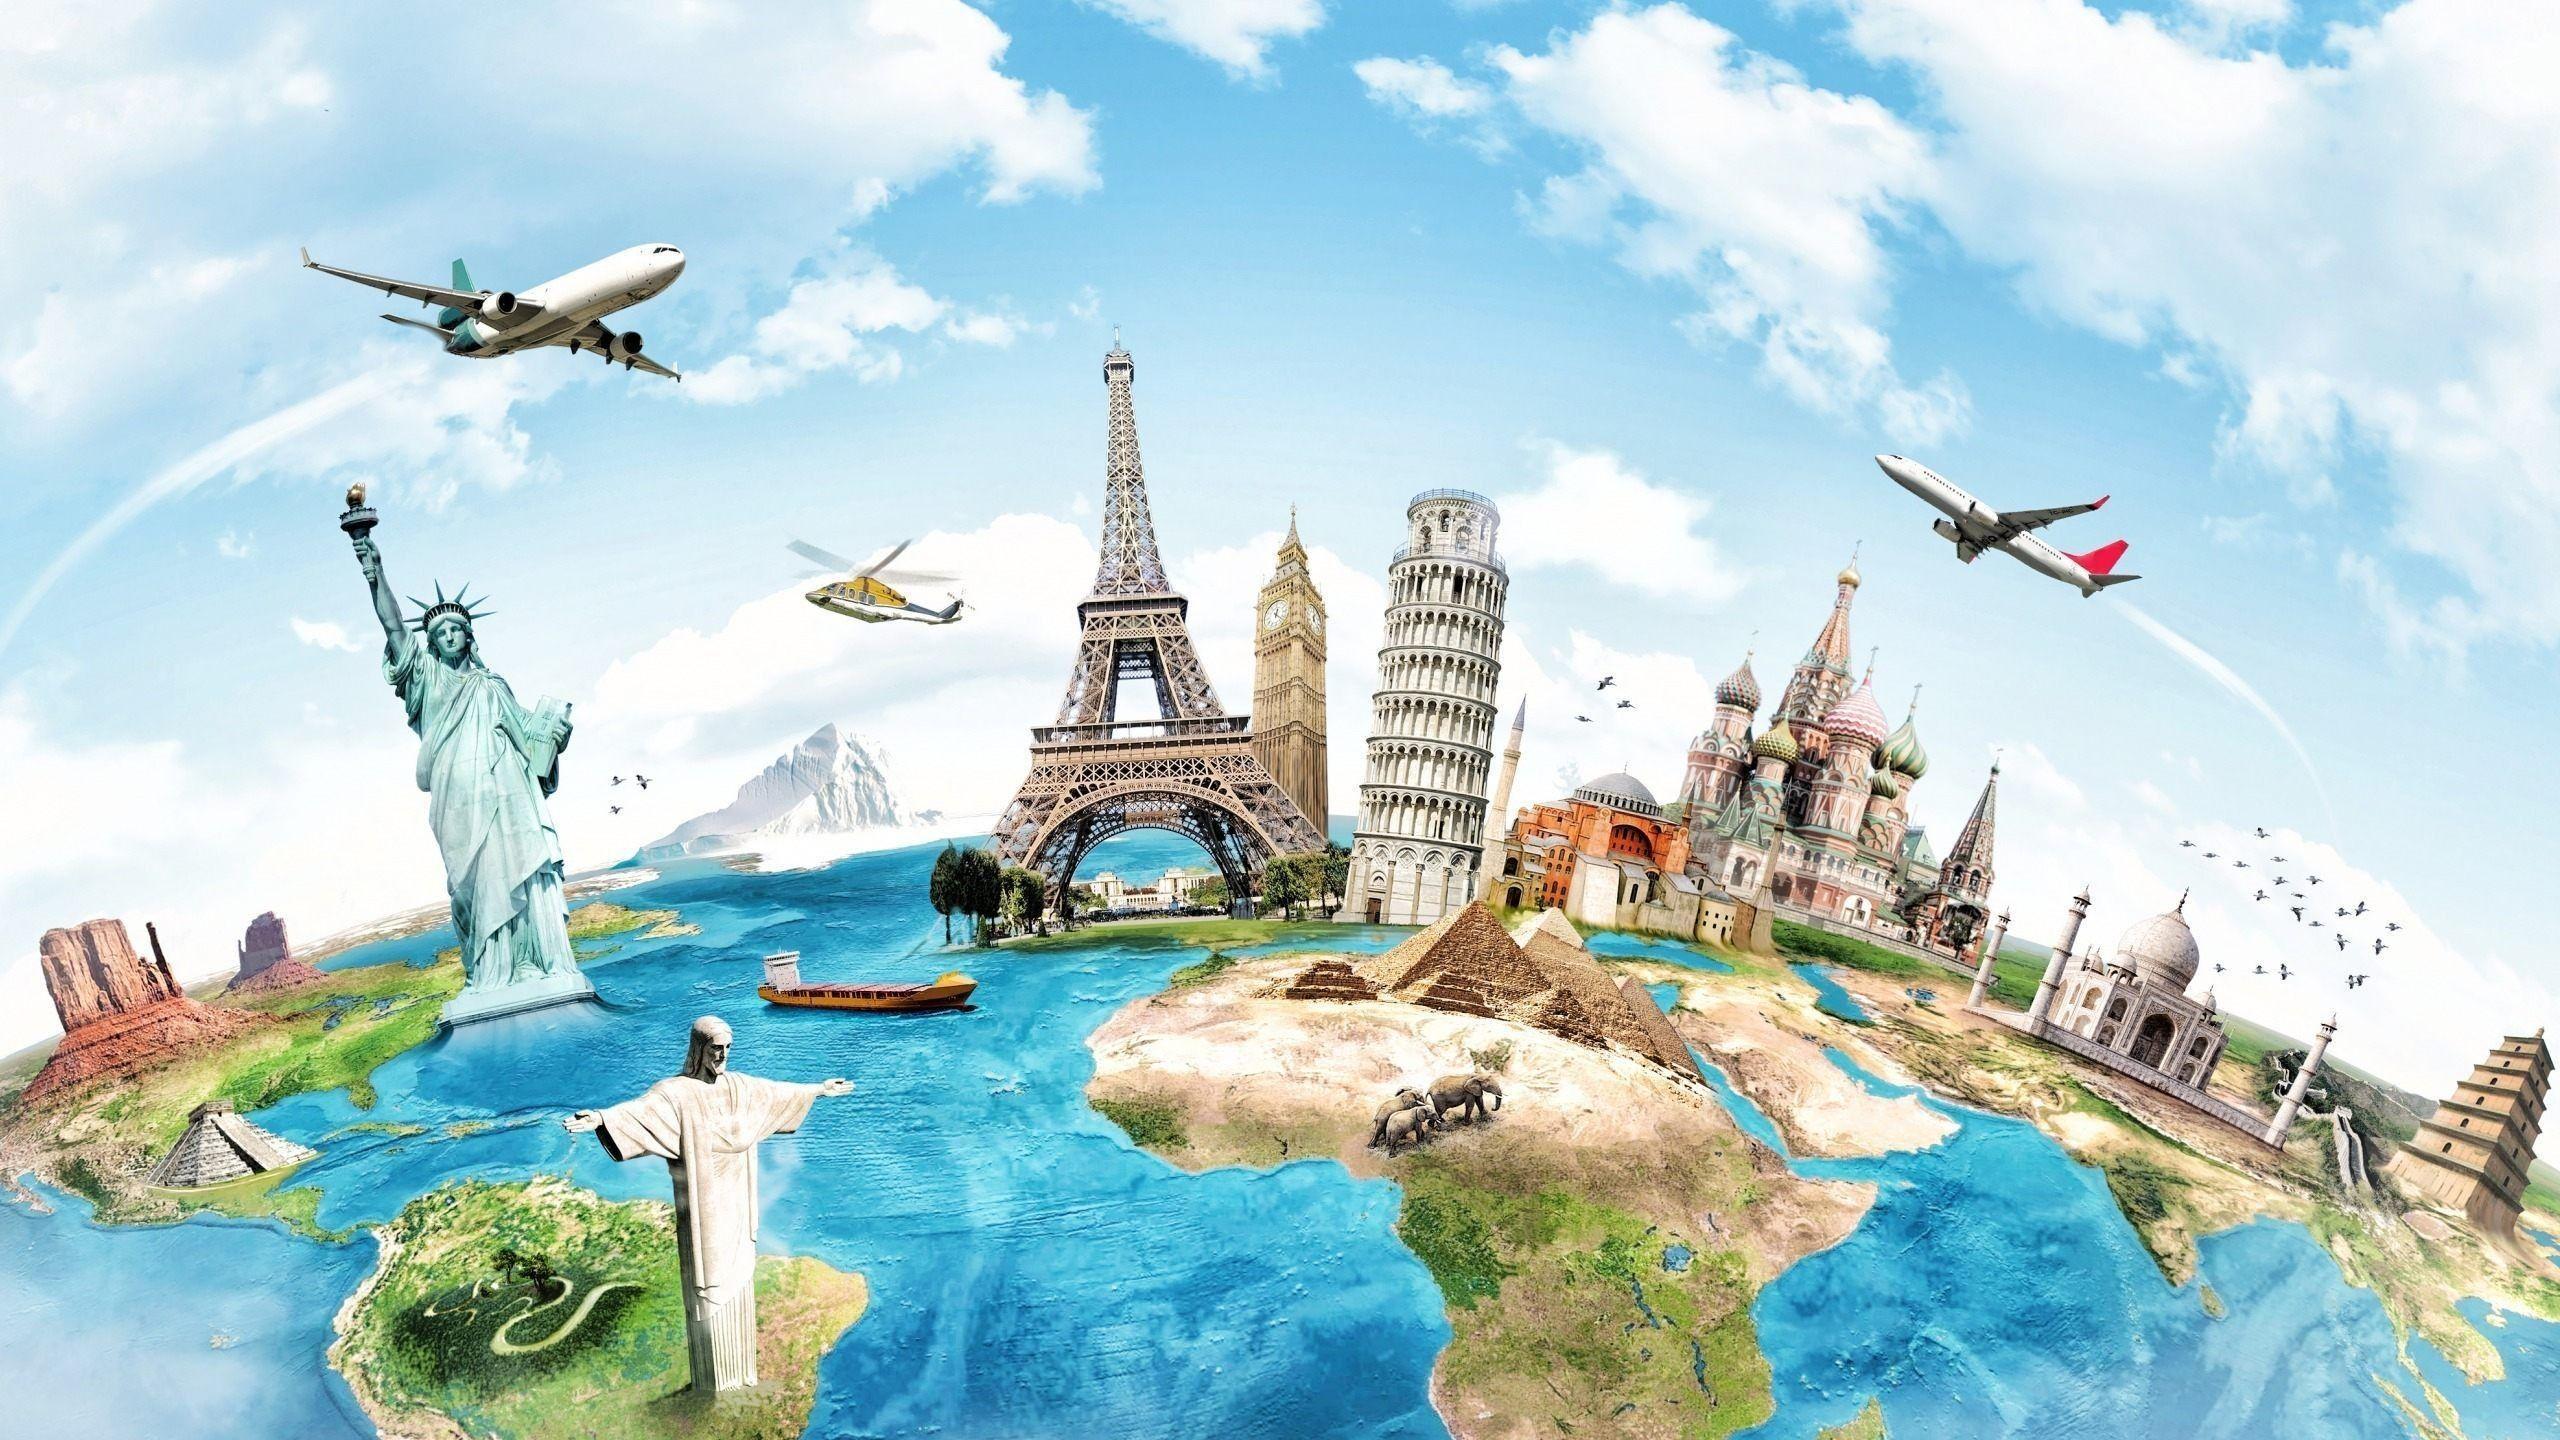 World Travel Desktop Wallpapers Top Free World Travel Desktop Backgrounds Wallpaperaccess